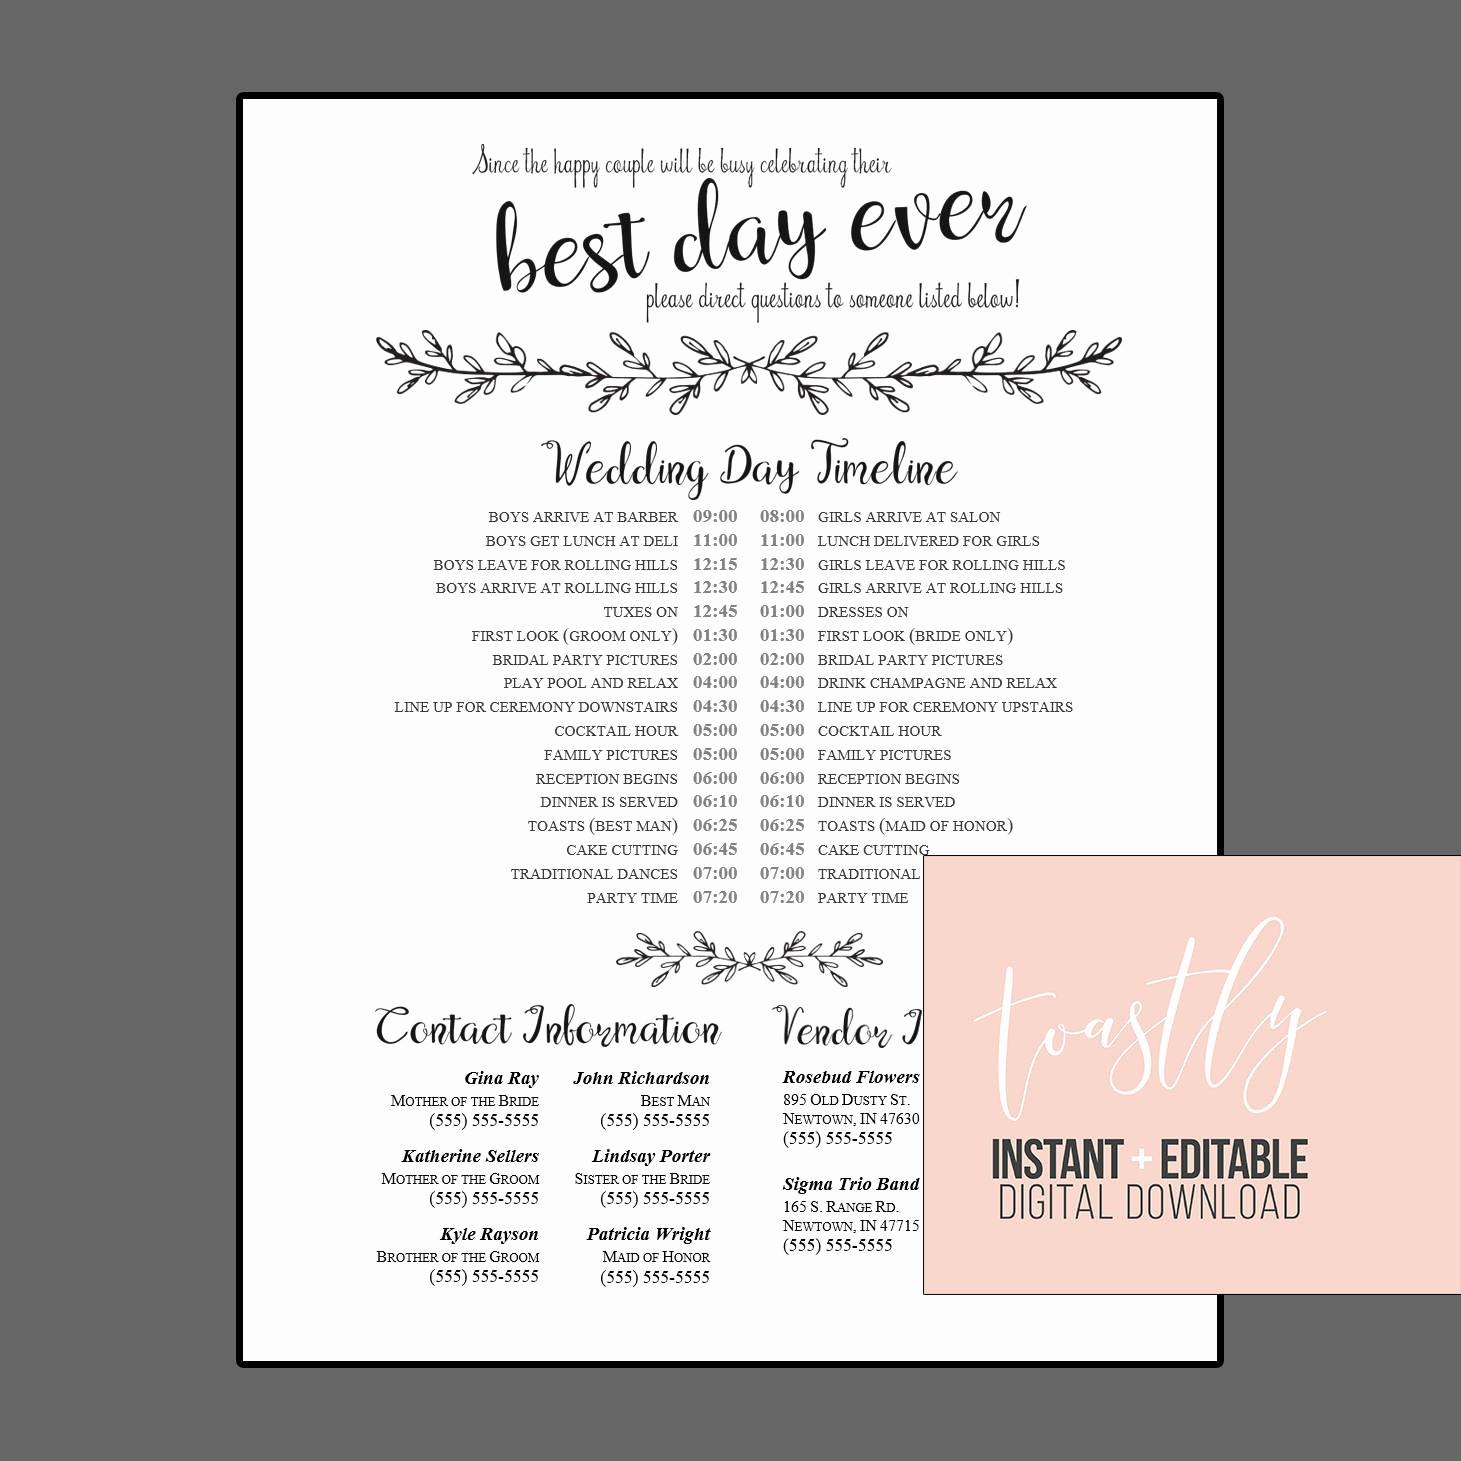 Wedding Day Timeline Template Free Elegant Editable Wedding Timeline Edit In Word Phone Numbers and